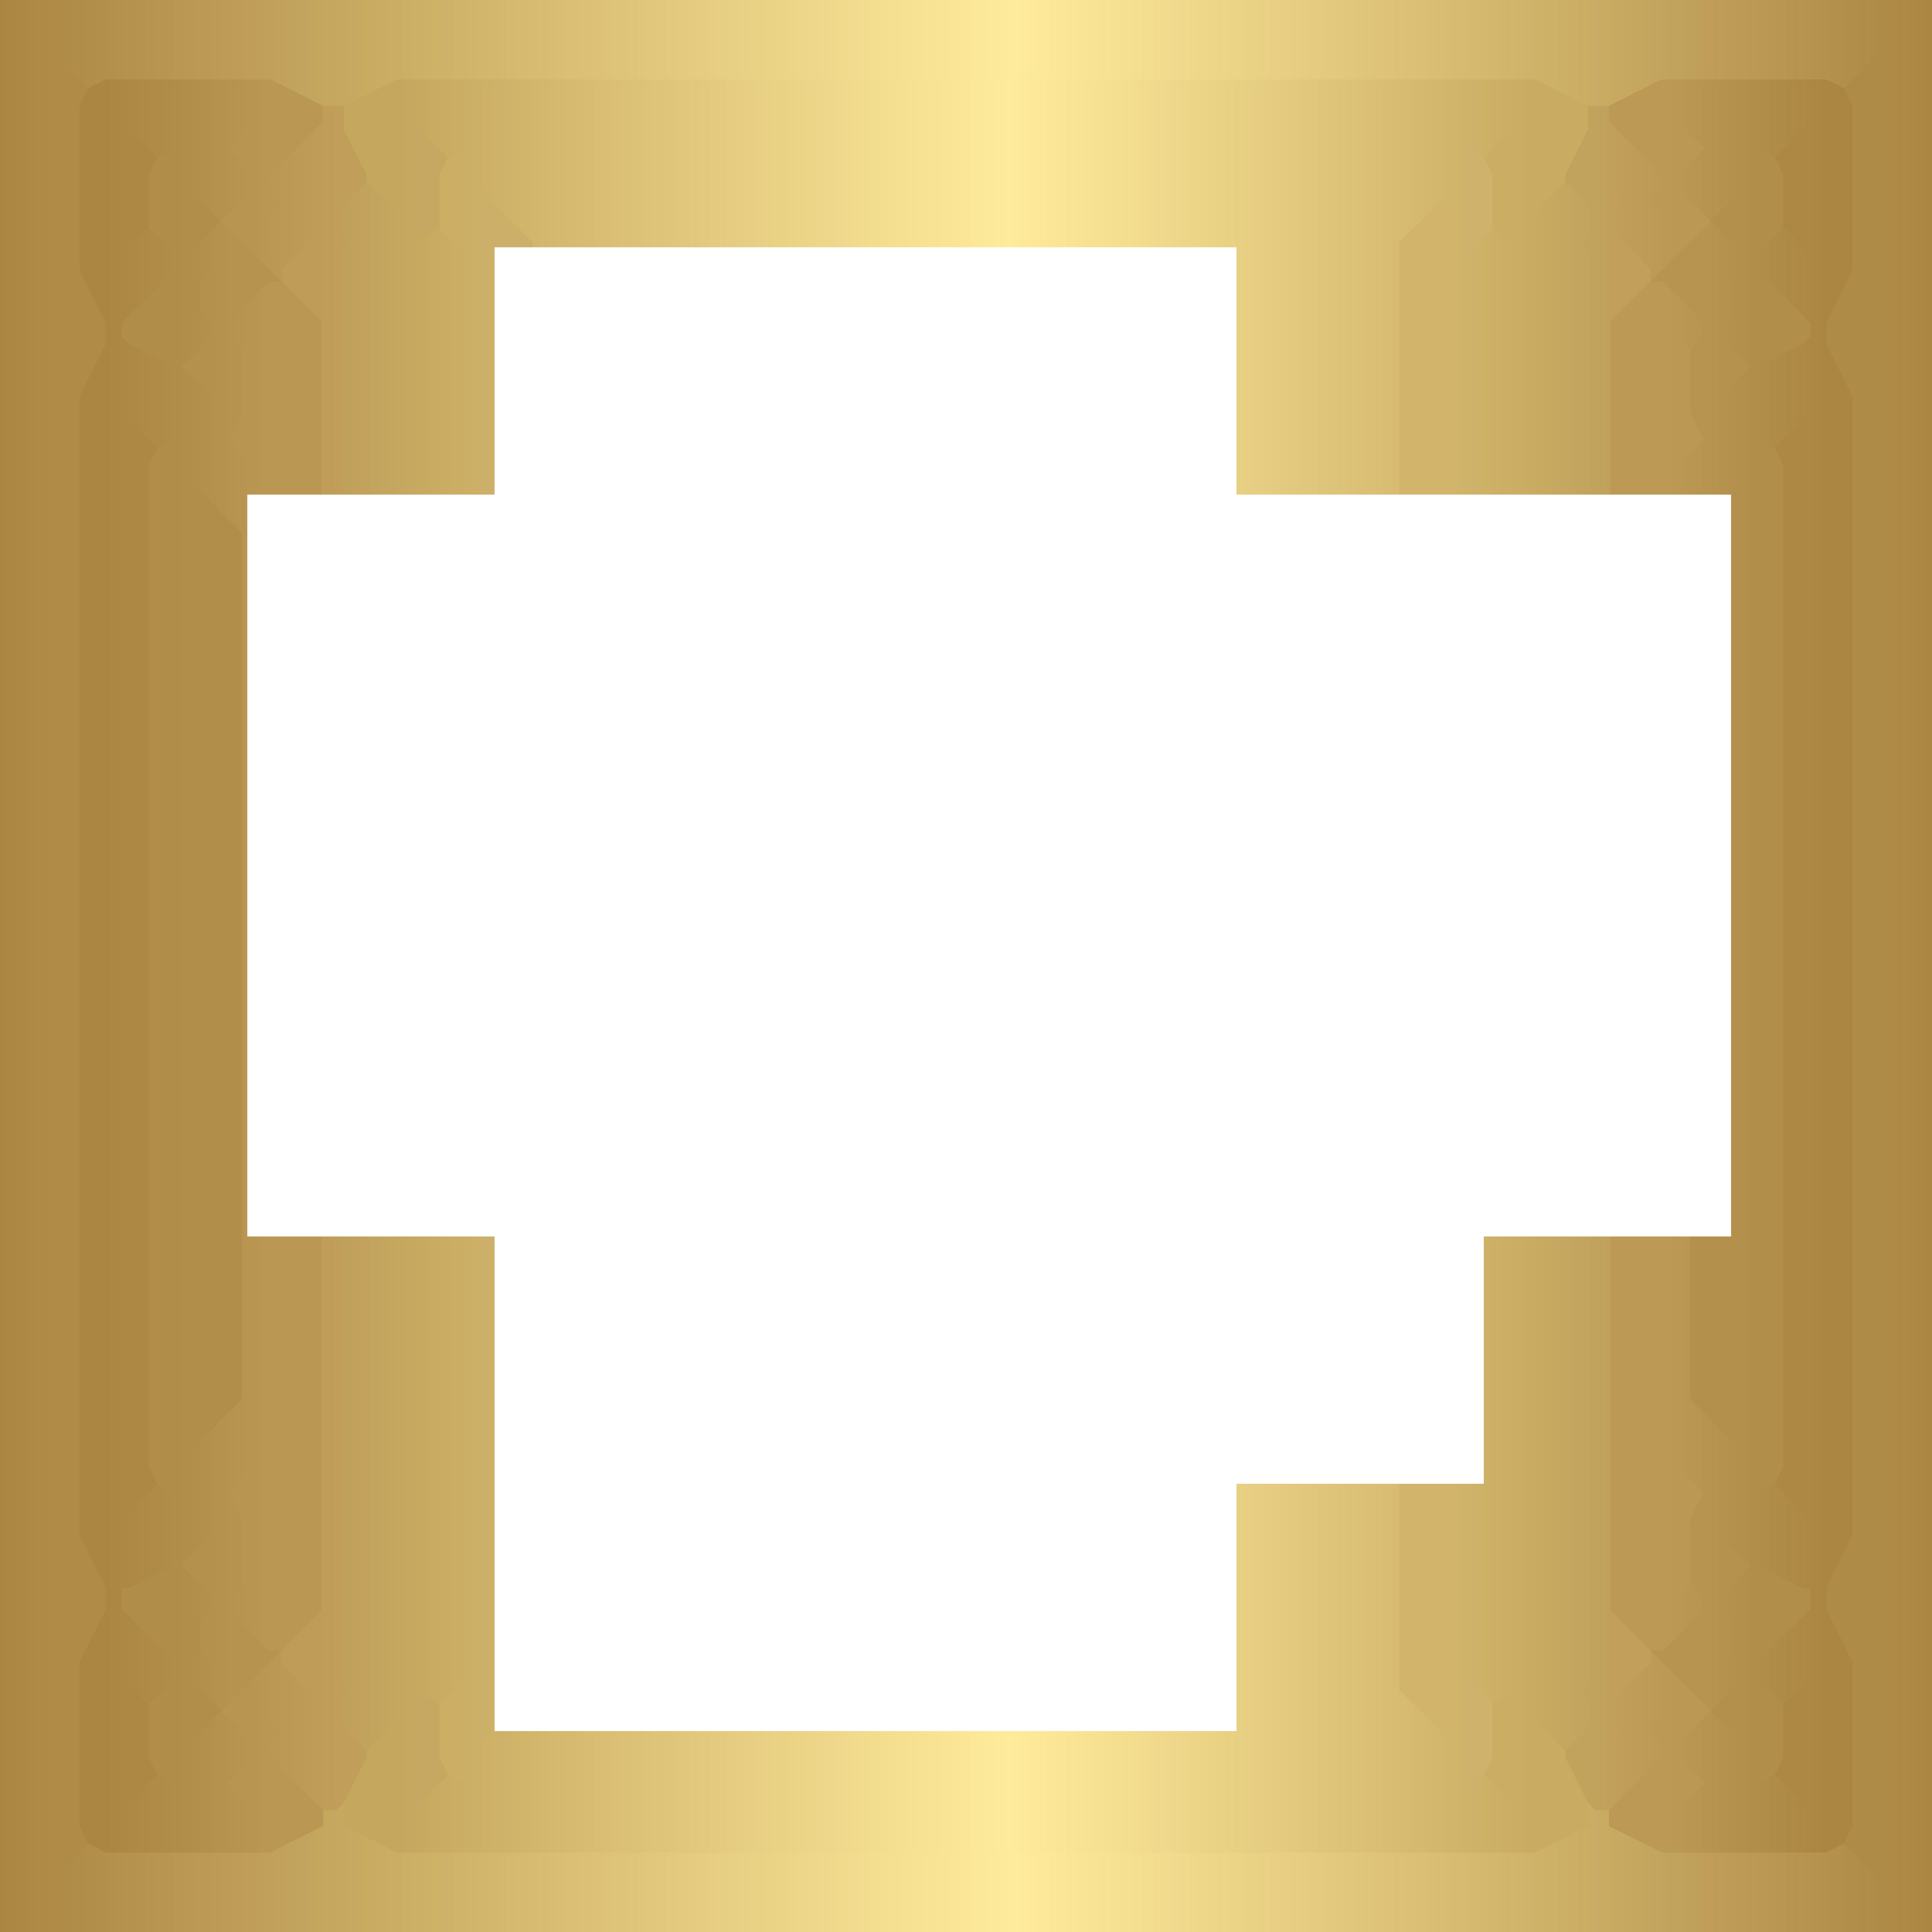 Clip border frame png. Clipart frames art deco